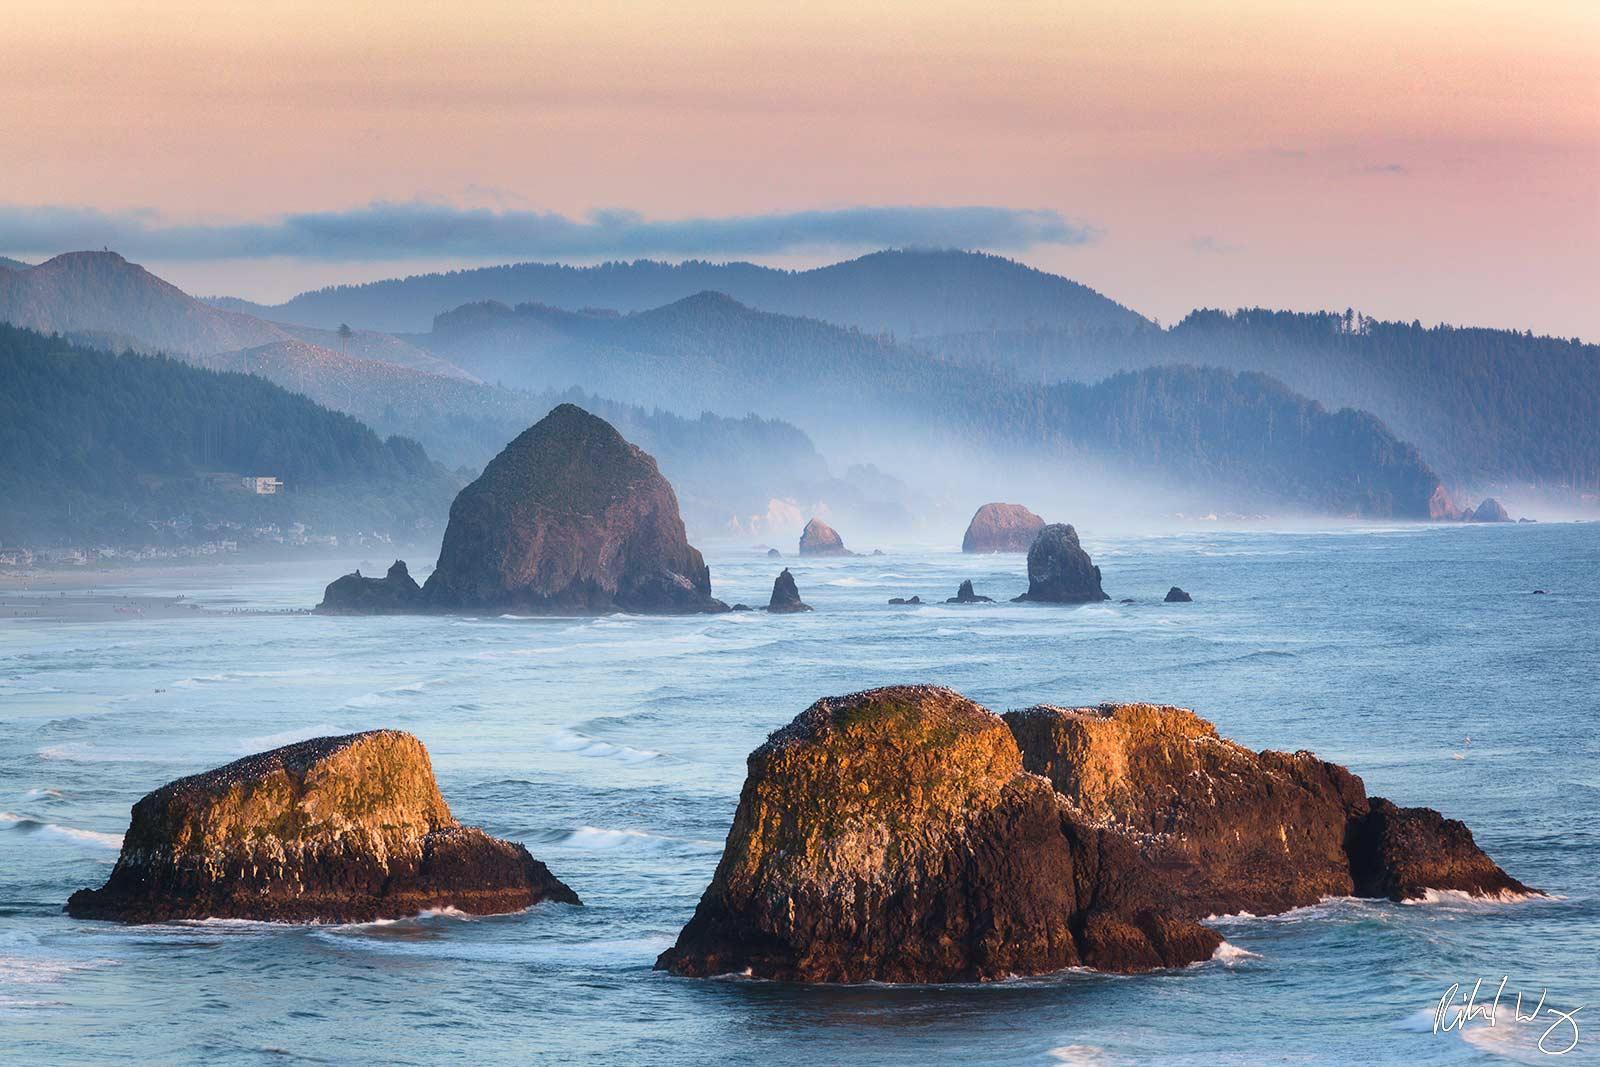 Cannon Beach Seastacks at Sunset, Ecola State Park, Oregon, photo, photo